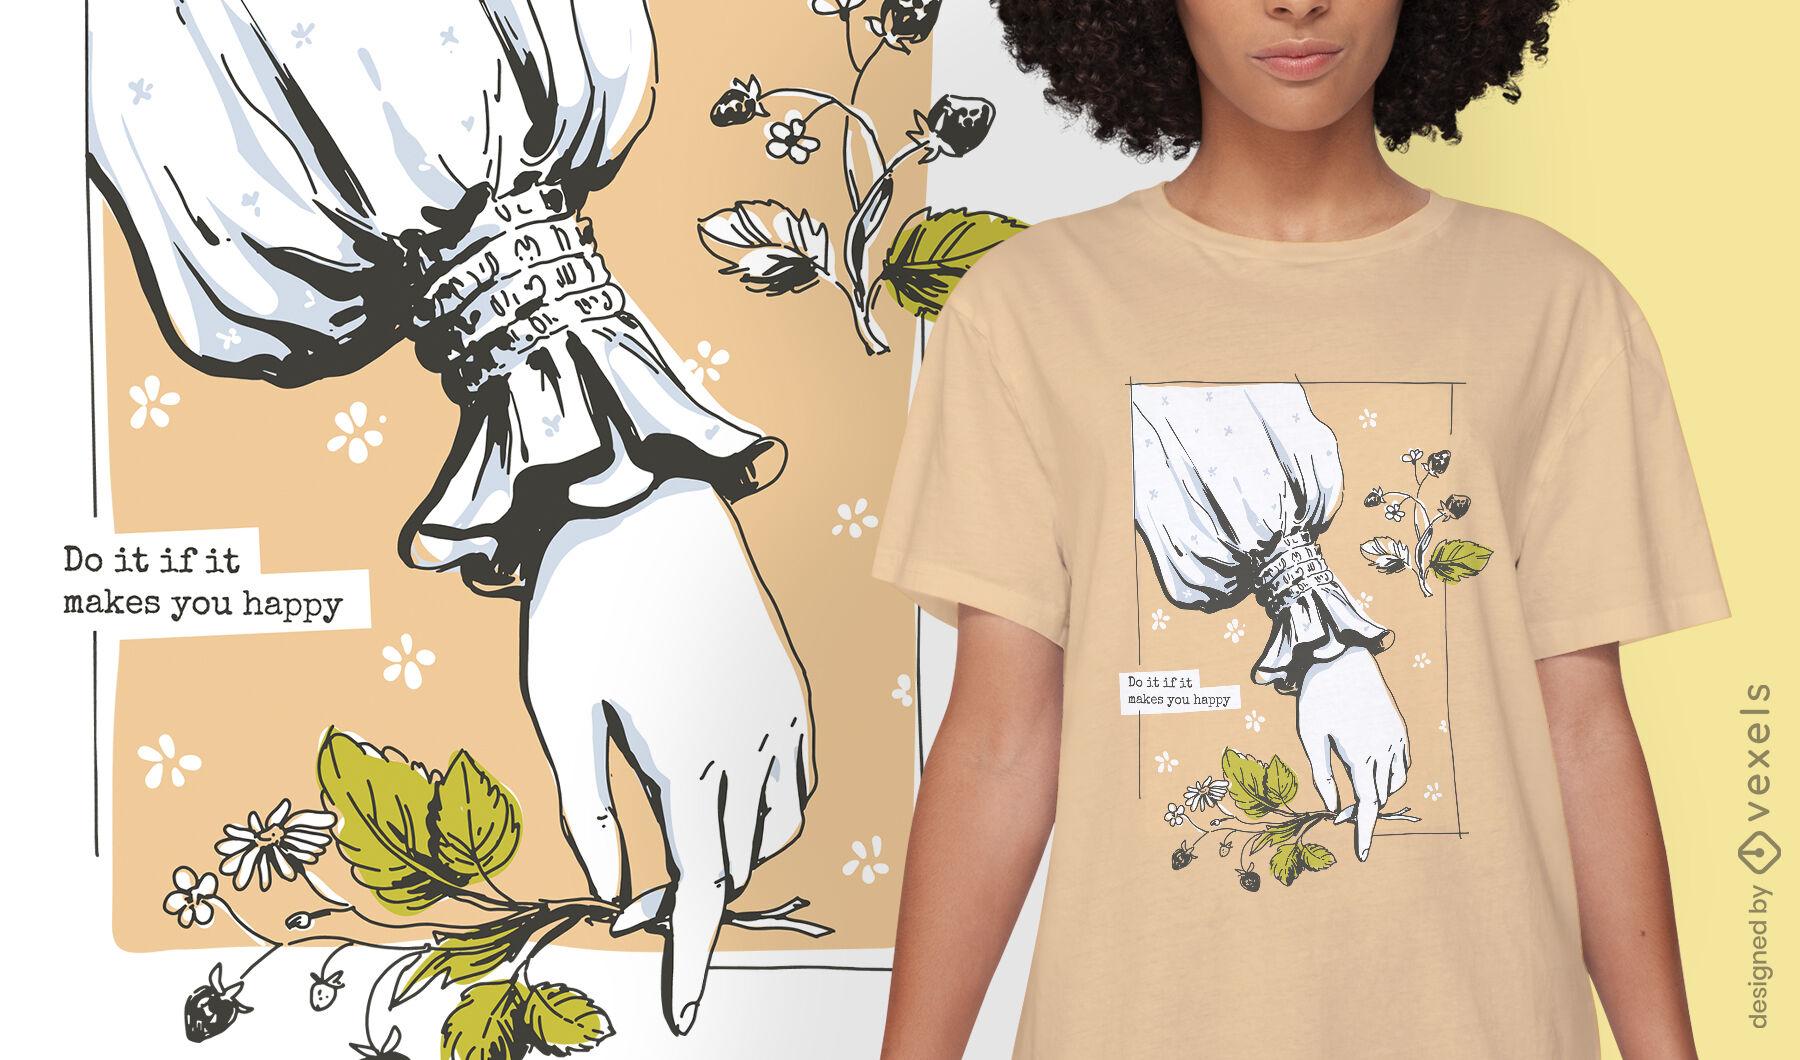 Diseño de camiseta de naturaleza de estilo de vida de Cottagecore